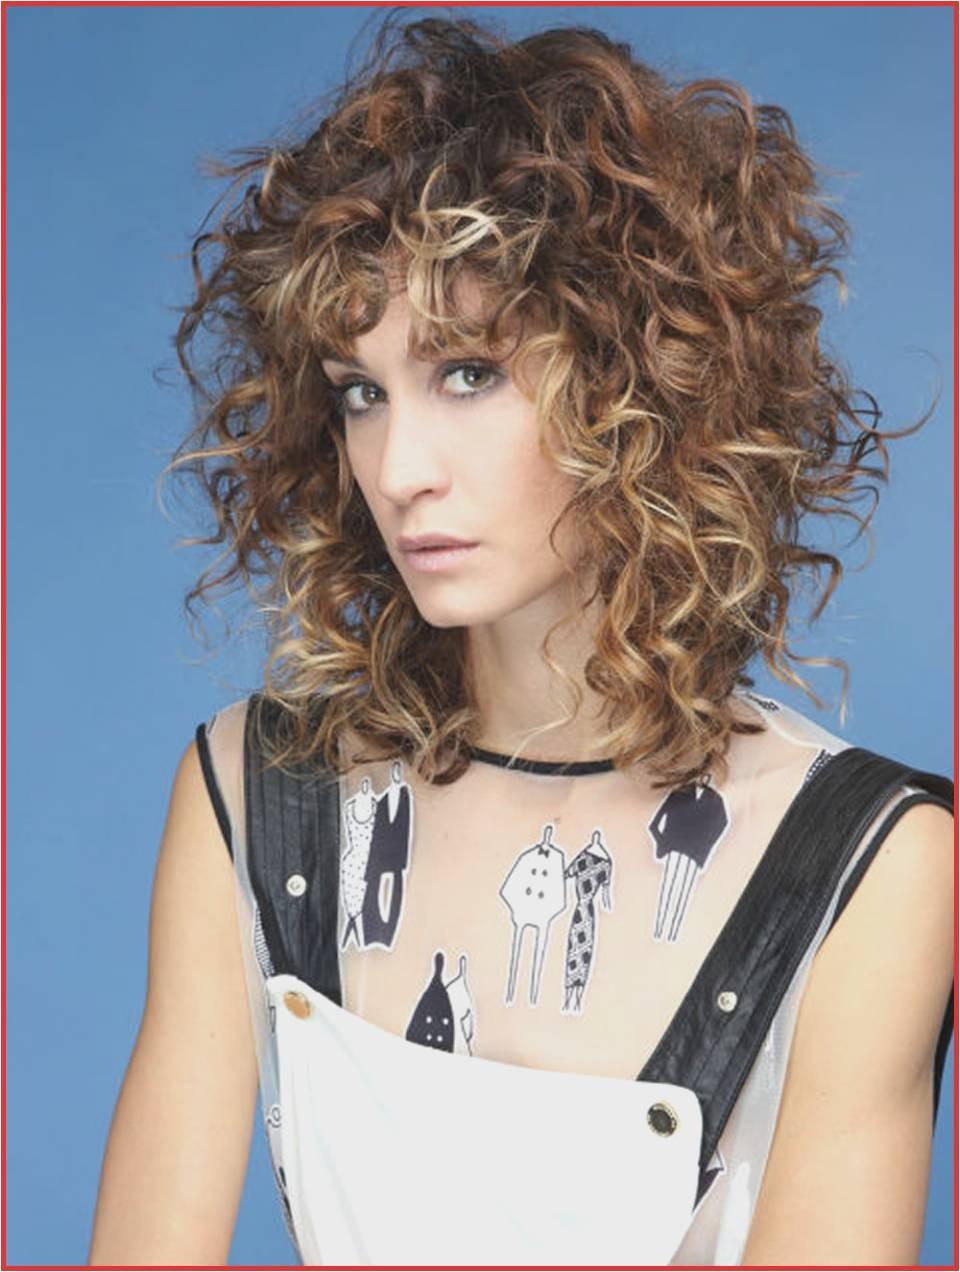 Easy Hairstyles for Greasy Hair Luxury Fresh Styling Ideas for Long Curly Hair Easy Hairstyles